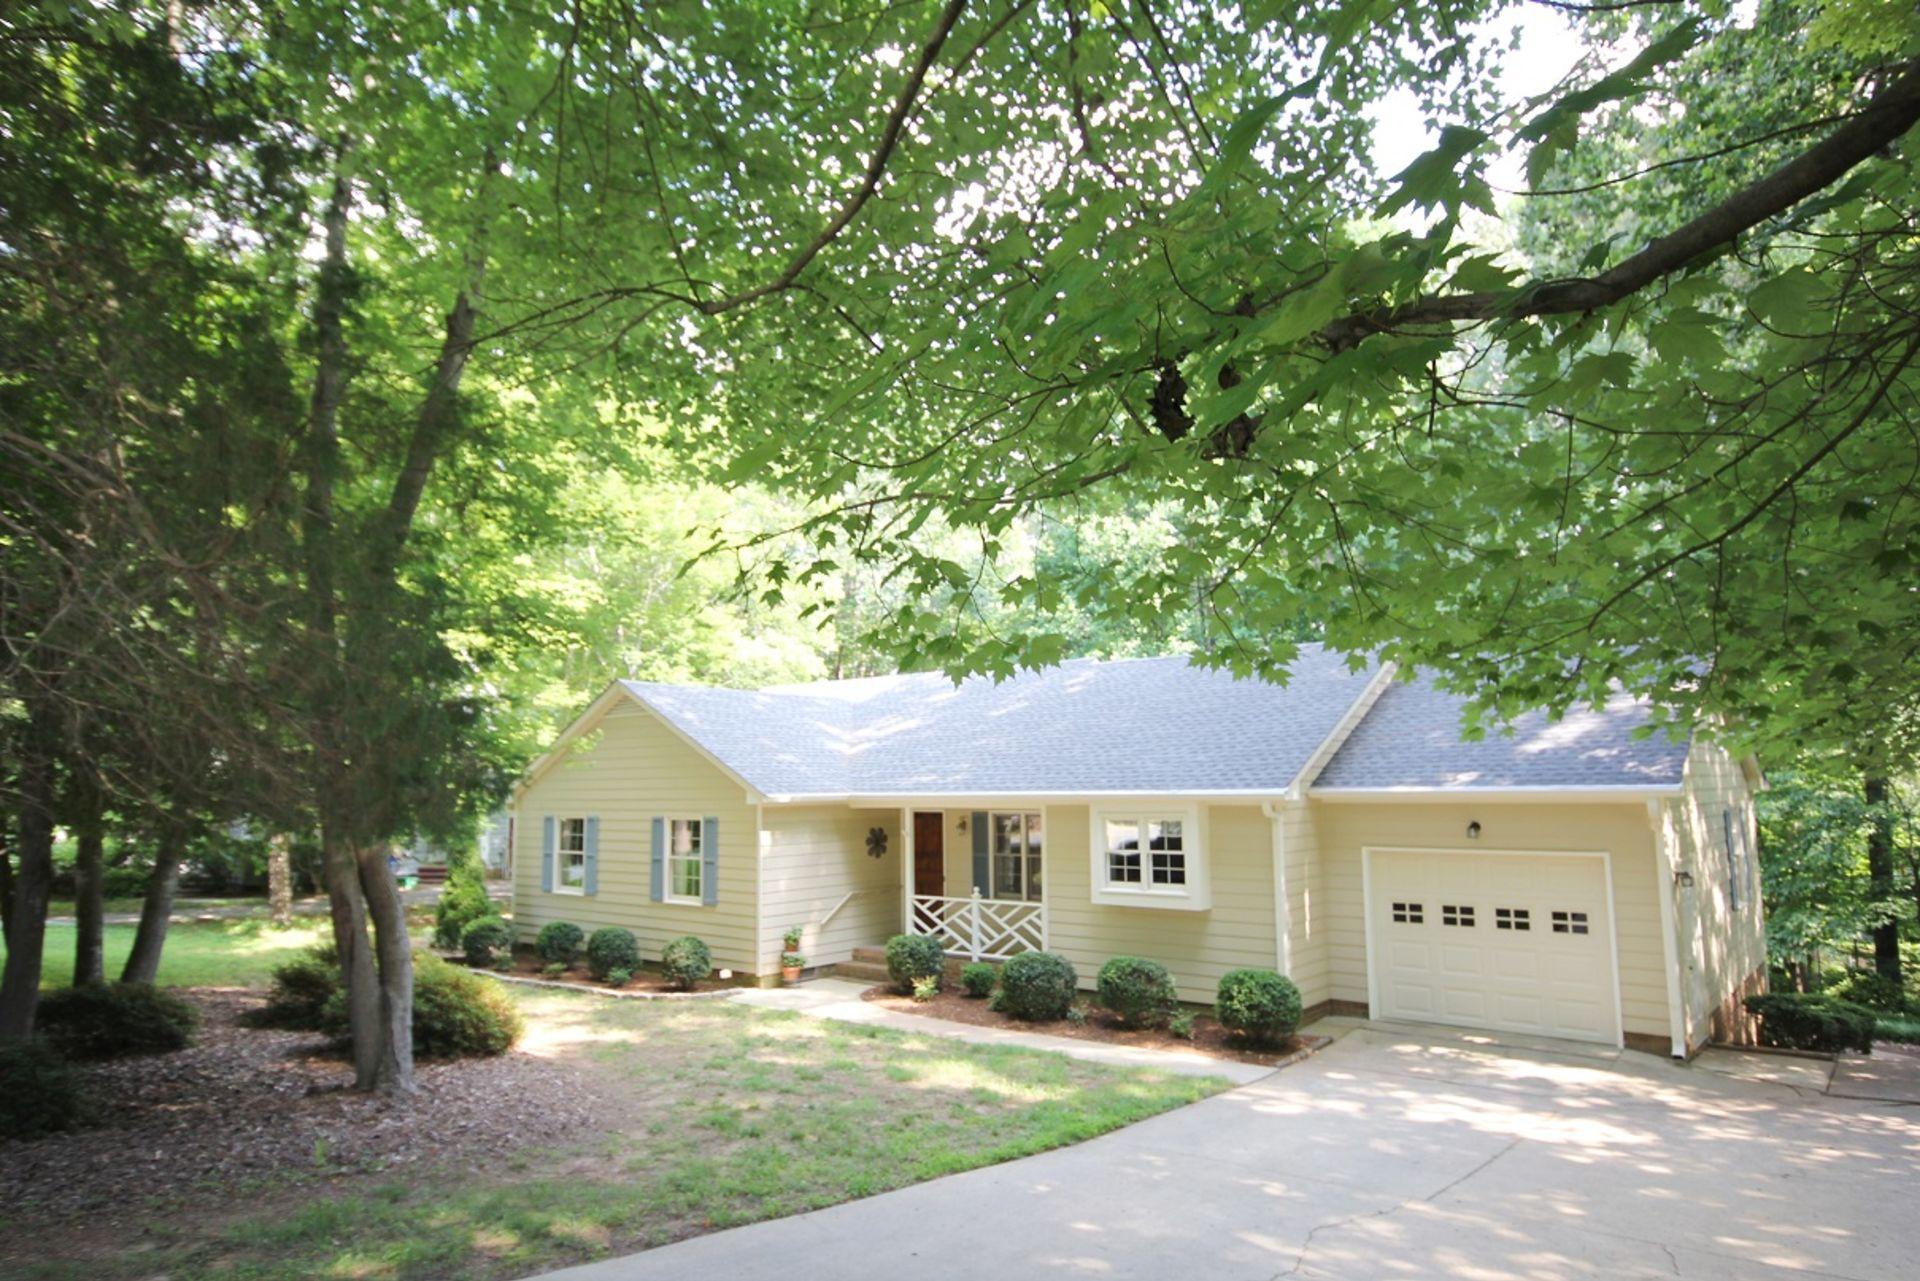 North Hills Ranch!  $235,000 1550 sf 3 bedrooms!